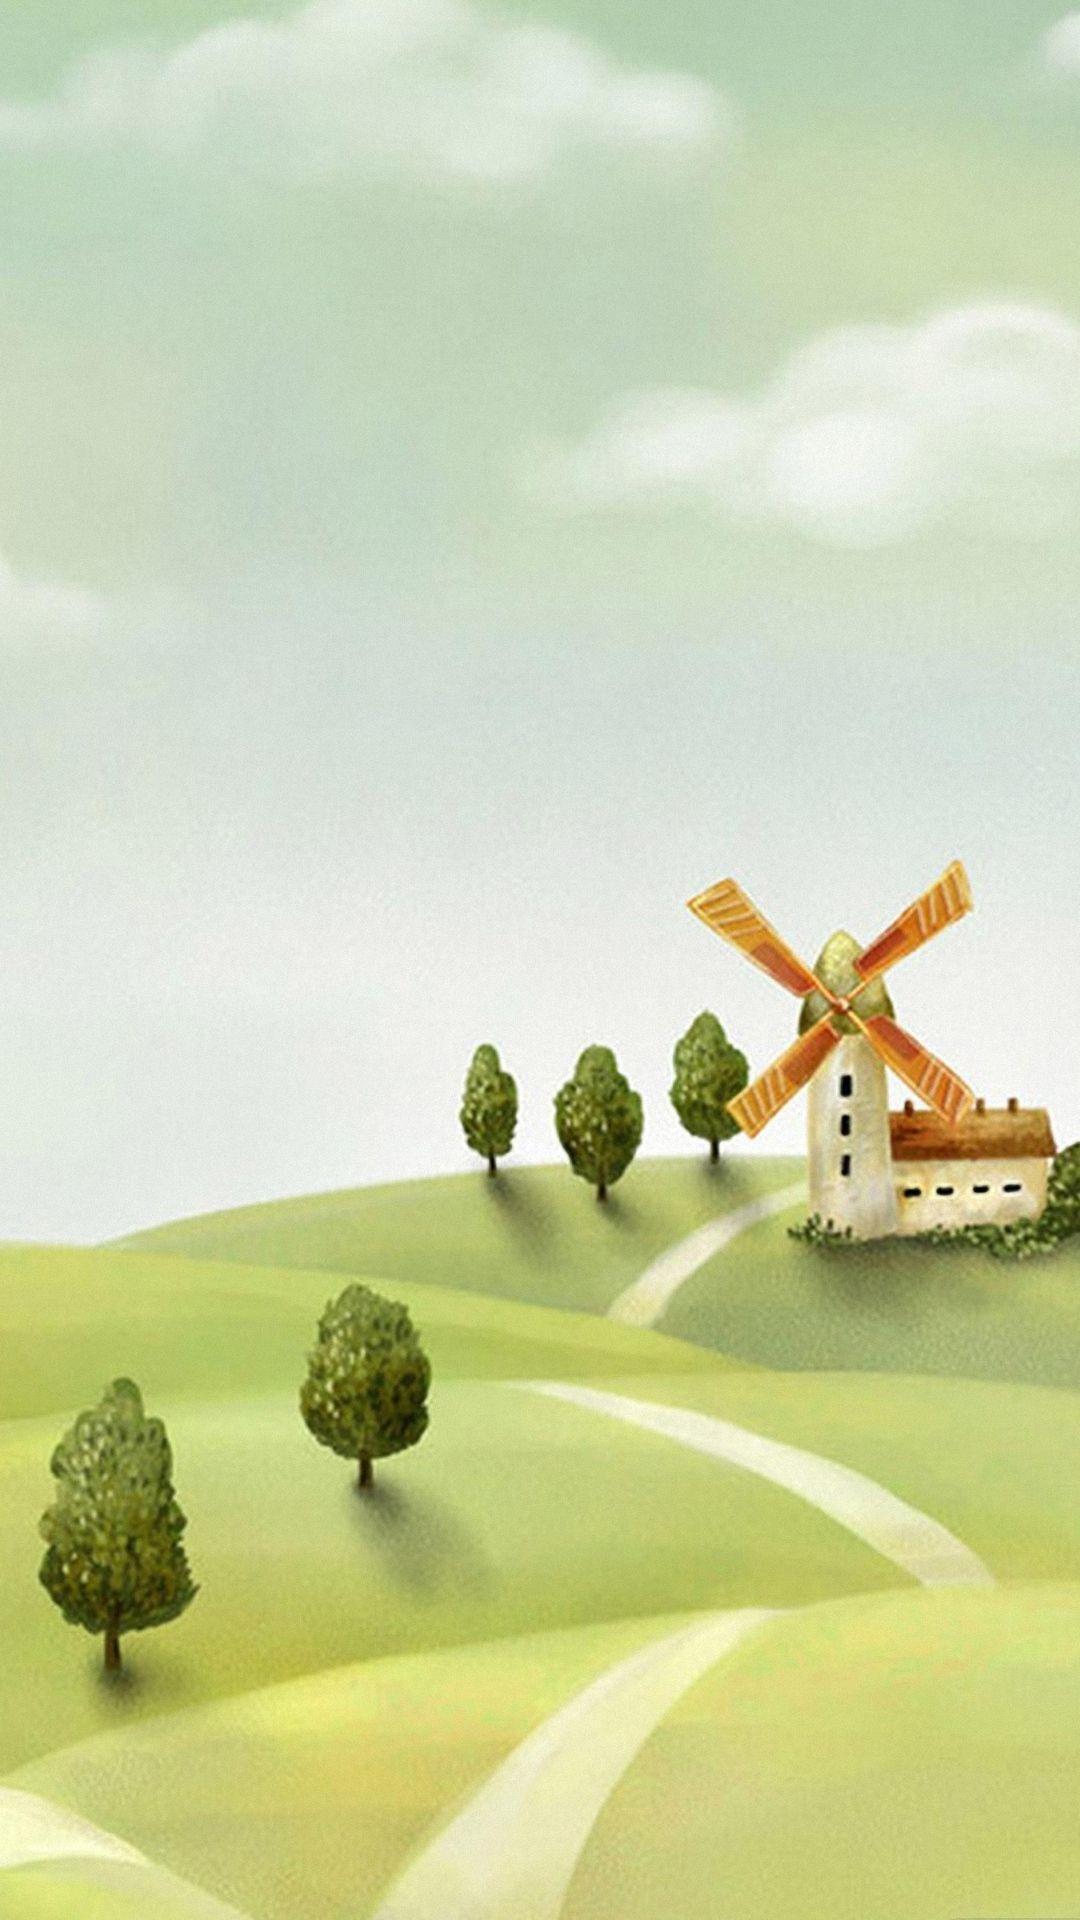 Cartoon Scenery Wallpapers - Top Free Cartoon Scenery ...